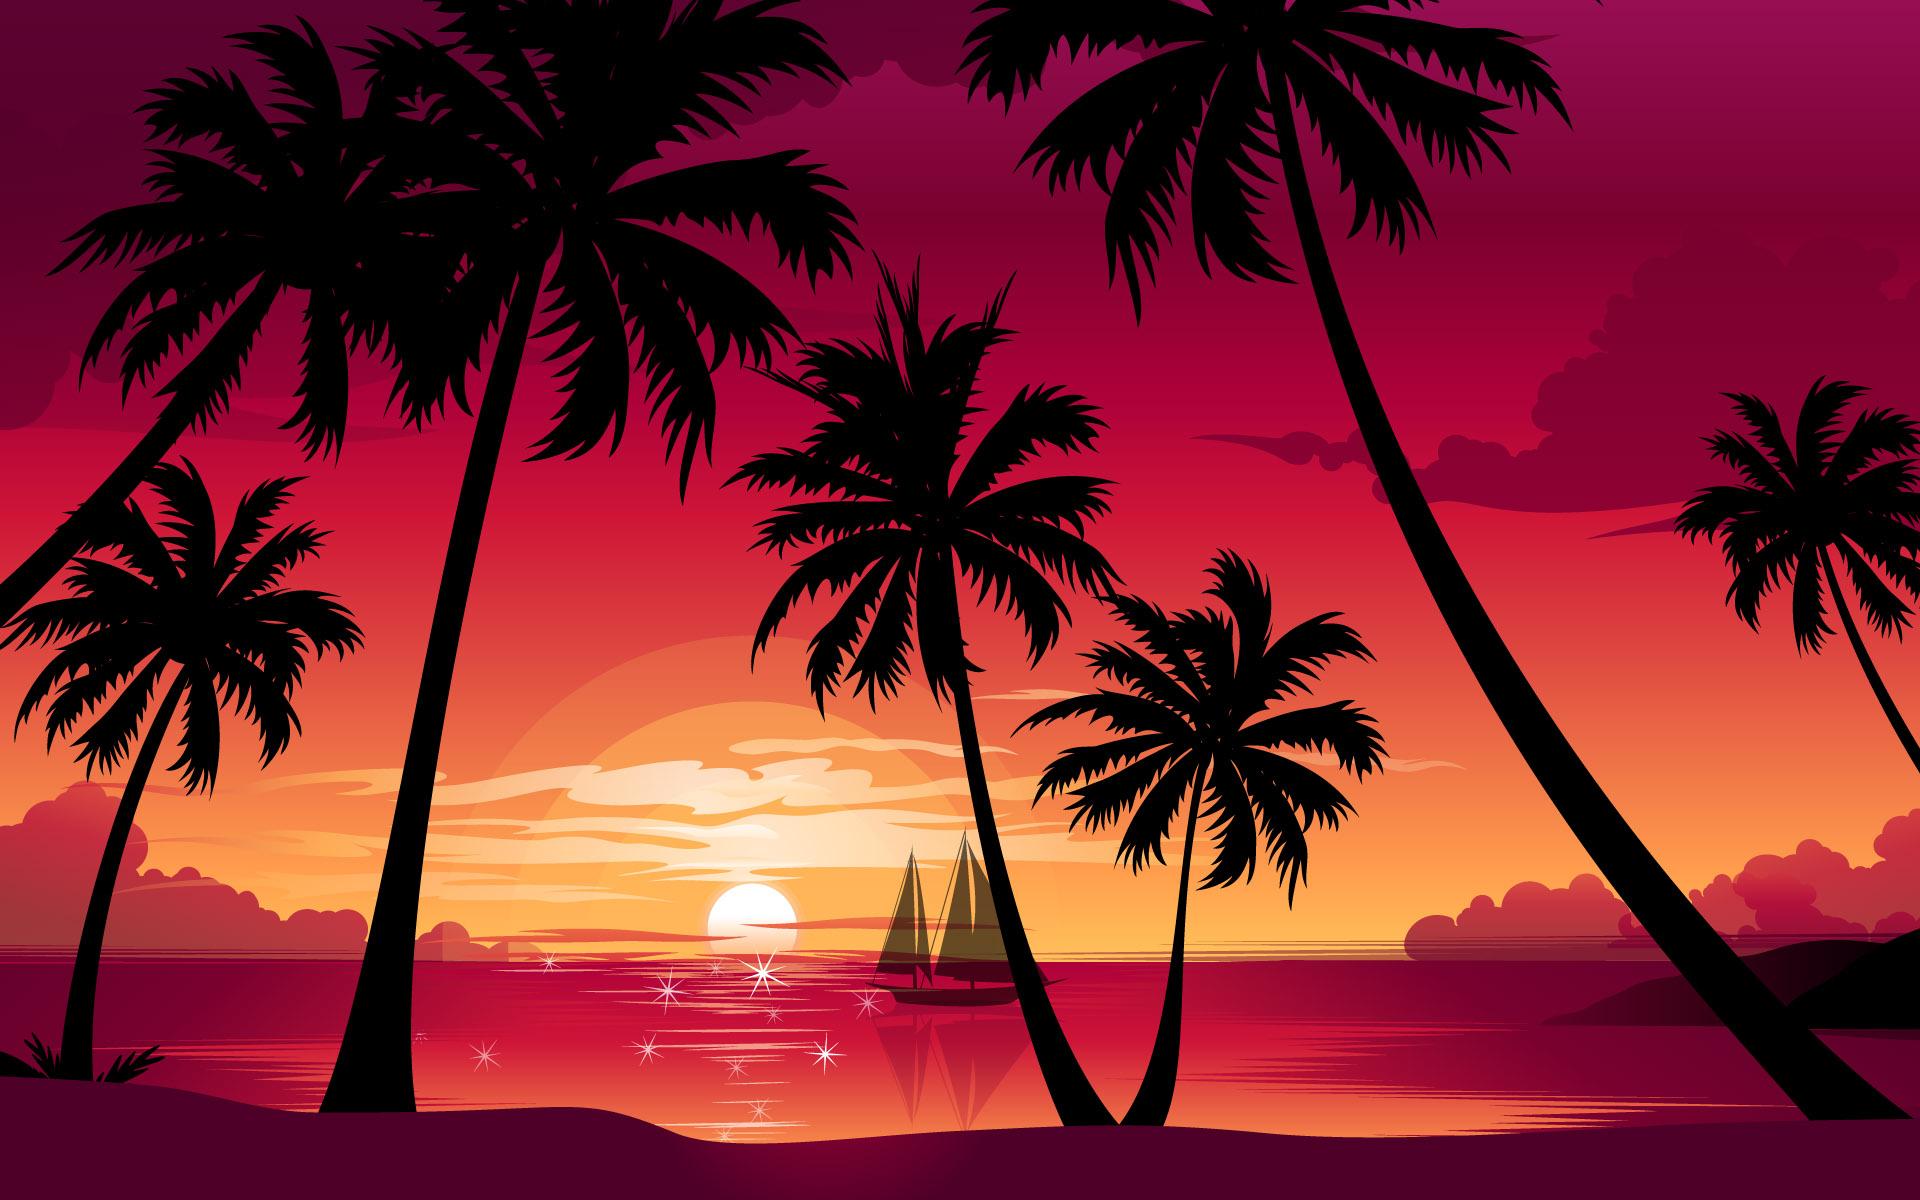 Sunset Beach Background Drawing - HD Wallpaper